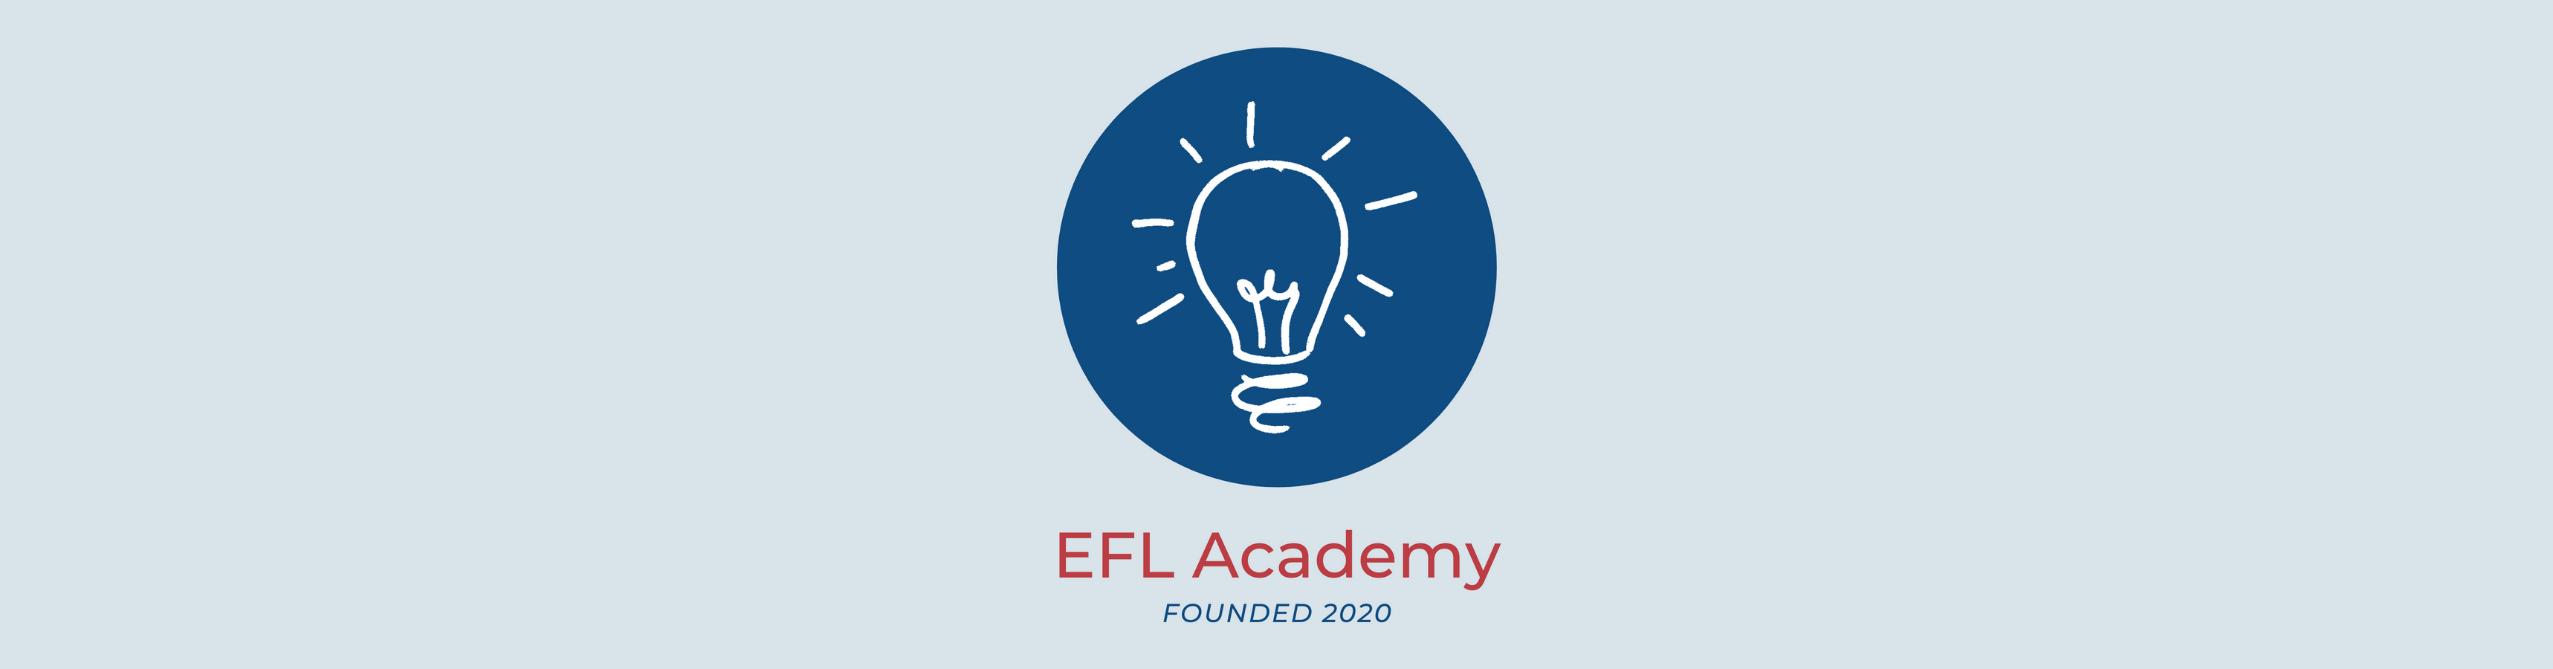 Efl academy 1